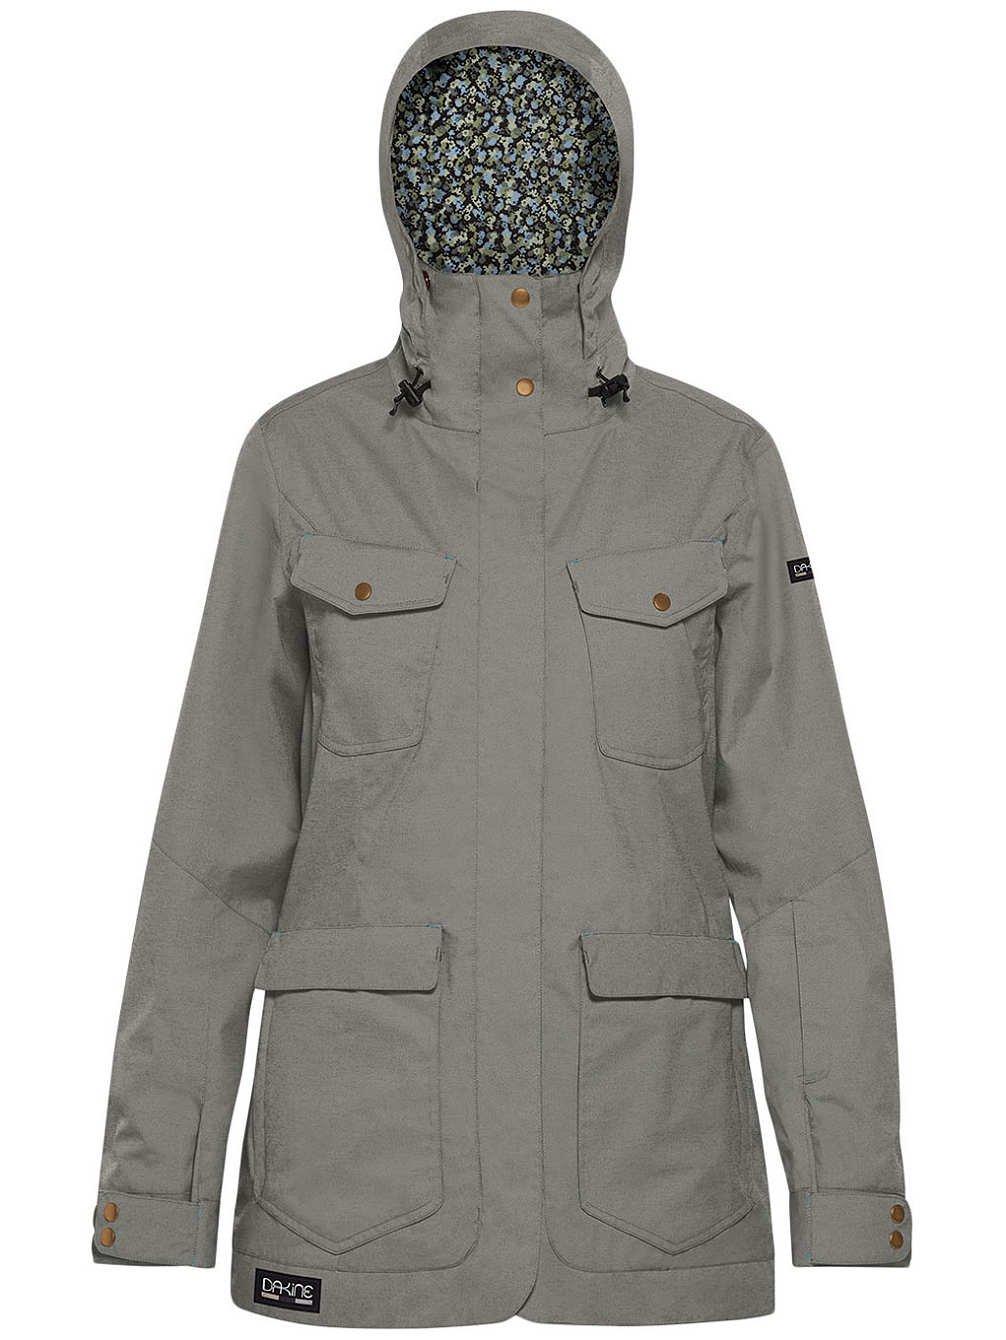 Damen Snowboard Jacke Dakine Canyons Jacket kaufen